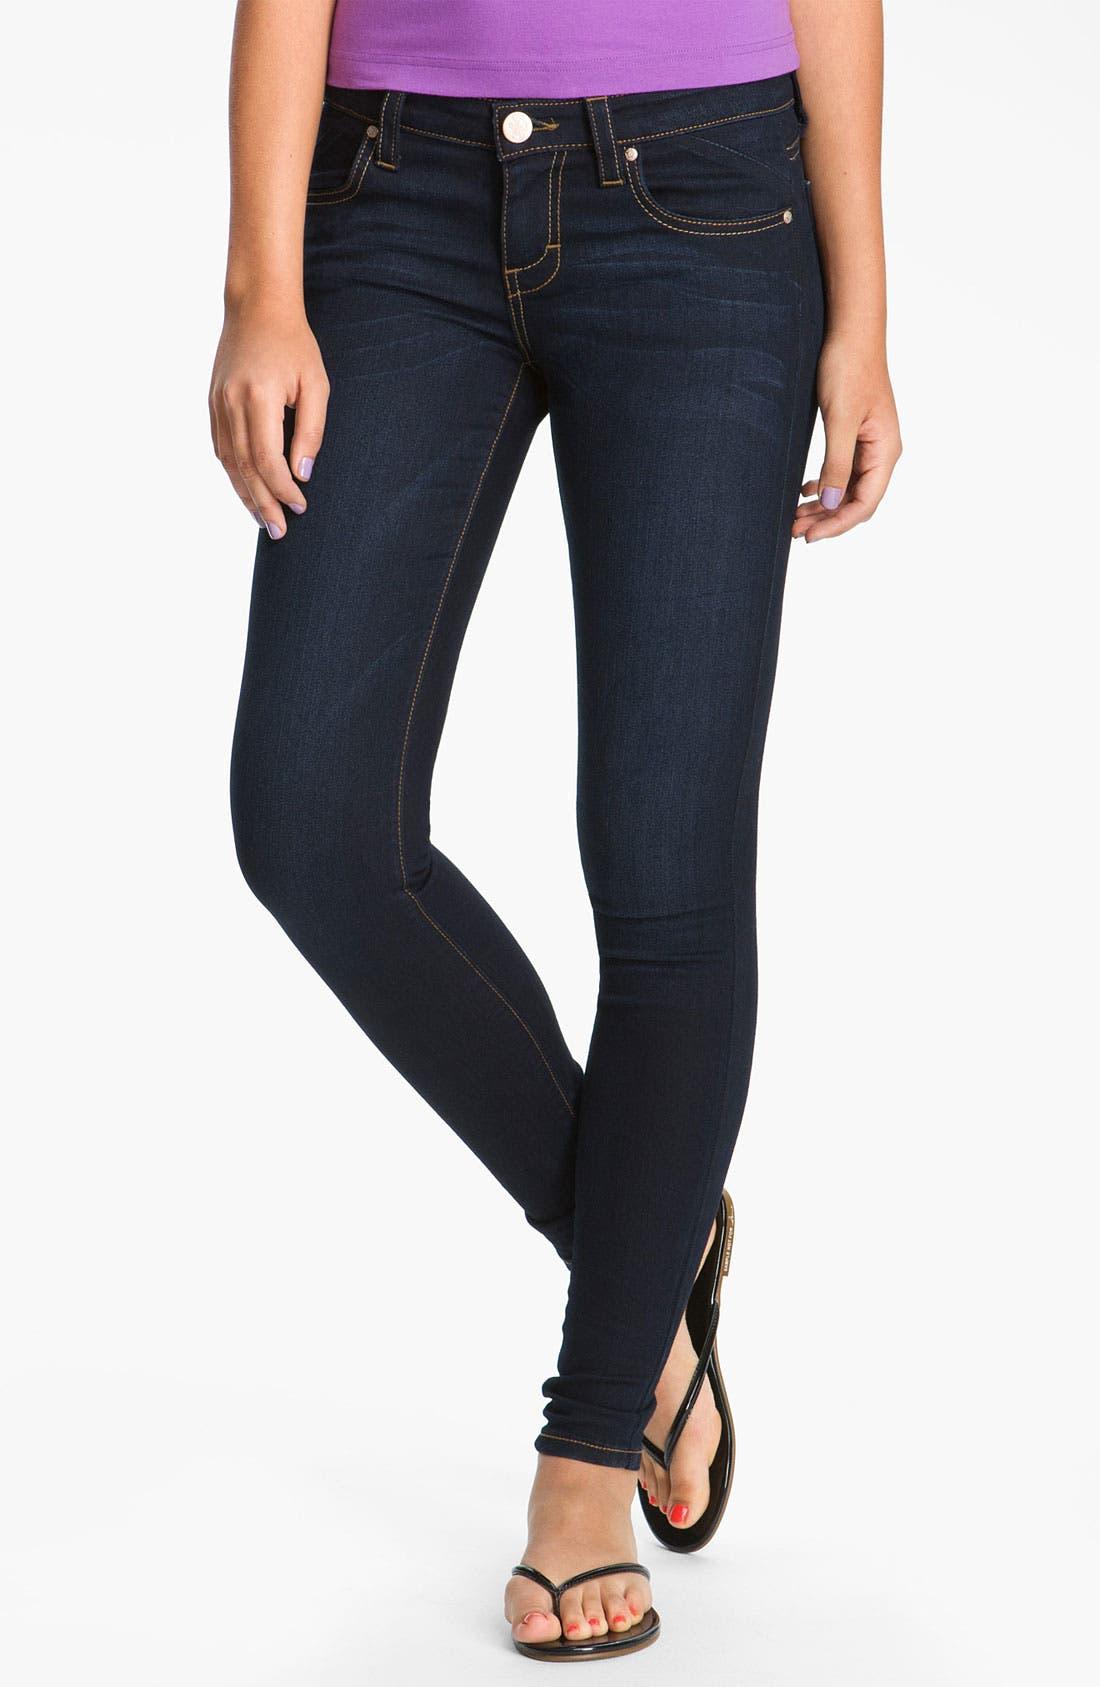 Alternate Image 1 Selected - STS Blue Skinny Jeans (Brisbane Dark) (Juniors) (Online Only)